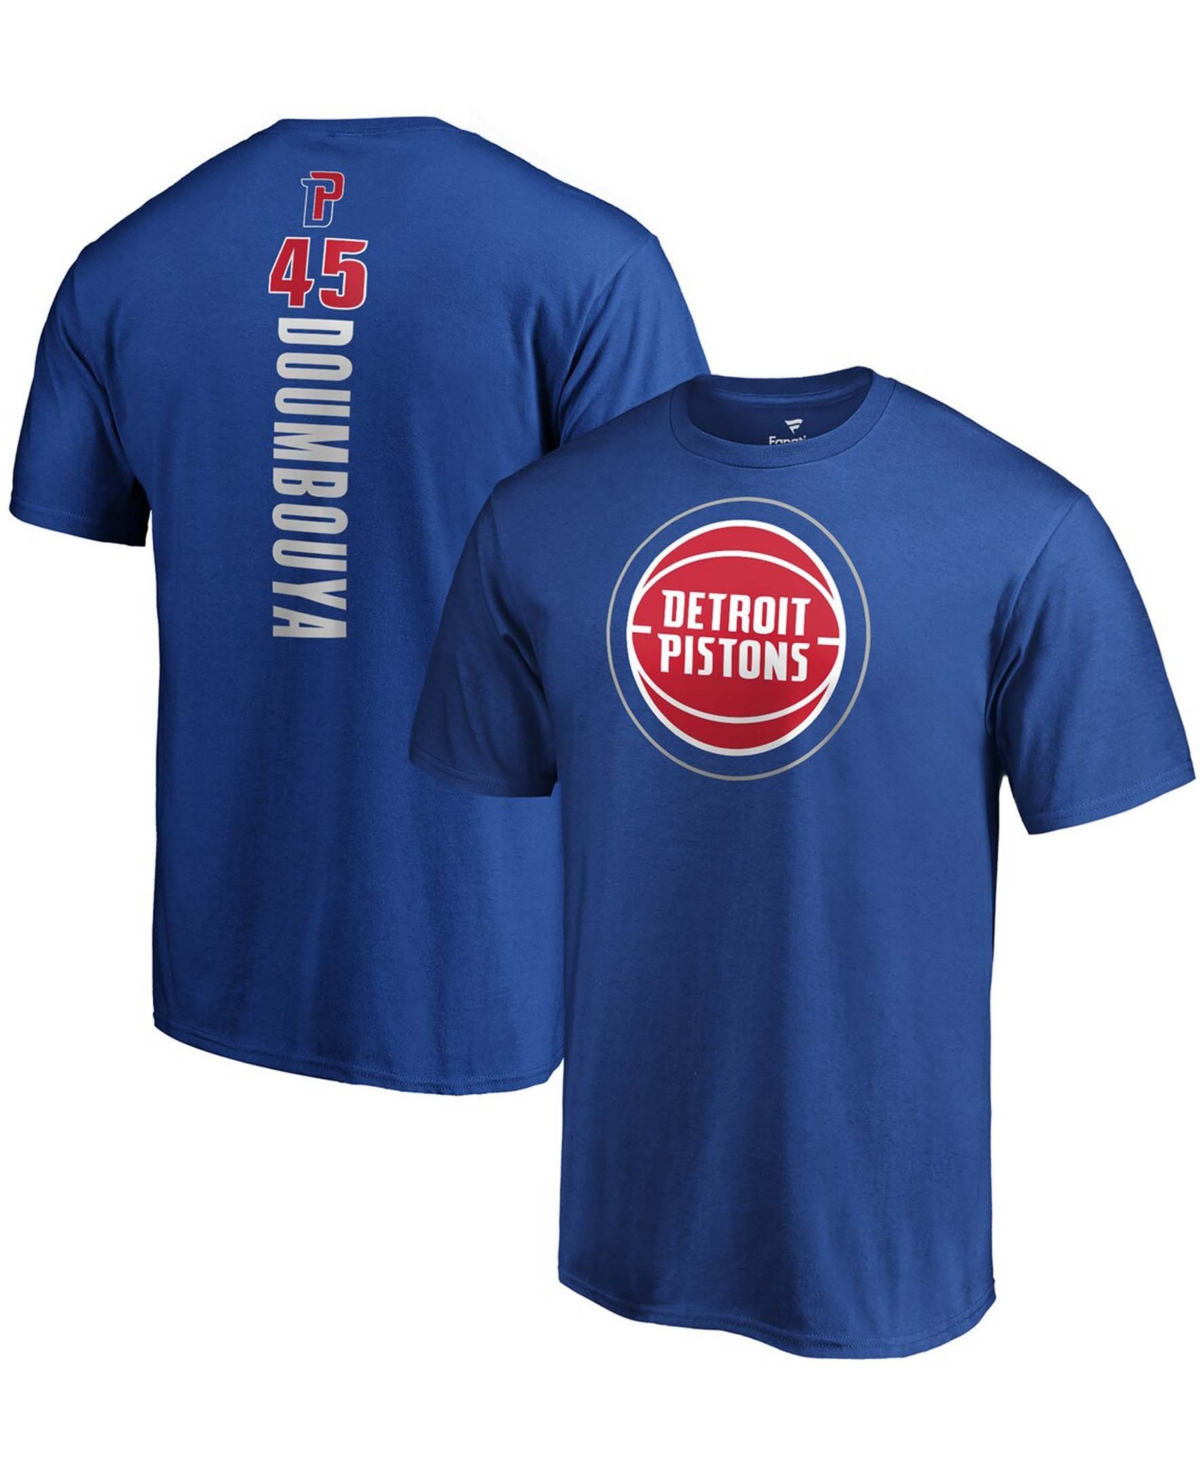 Men's Sekou Doumbouya Blue Detroit Pistons Playmaker Name and Number Logo T-shirt